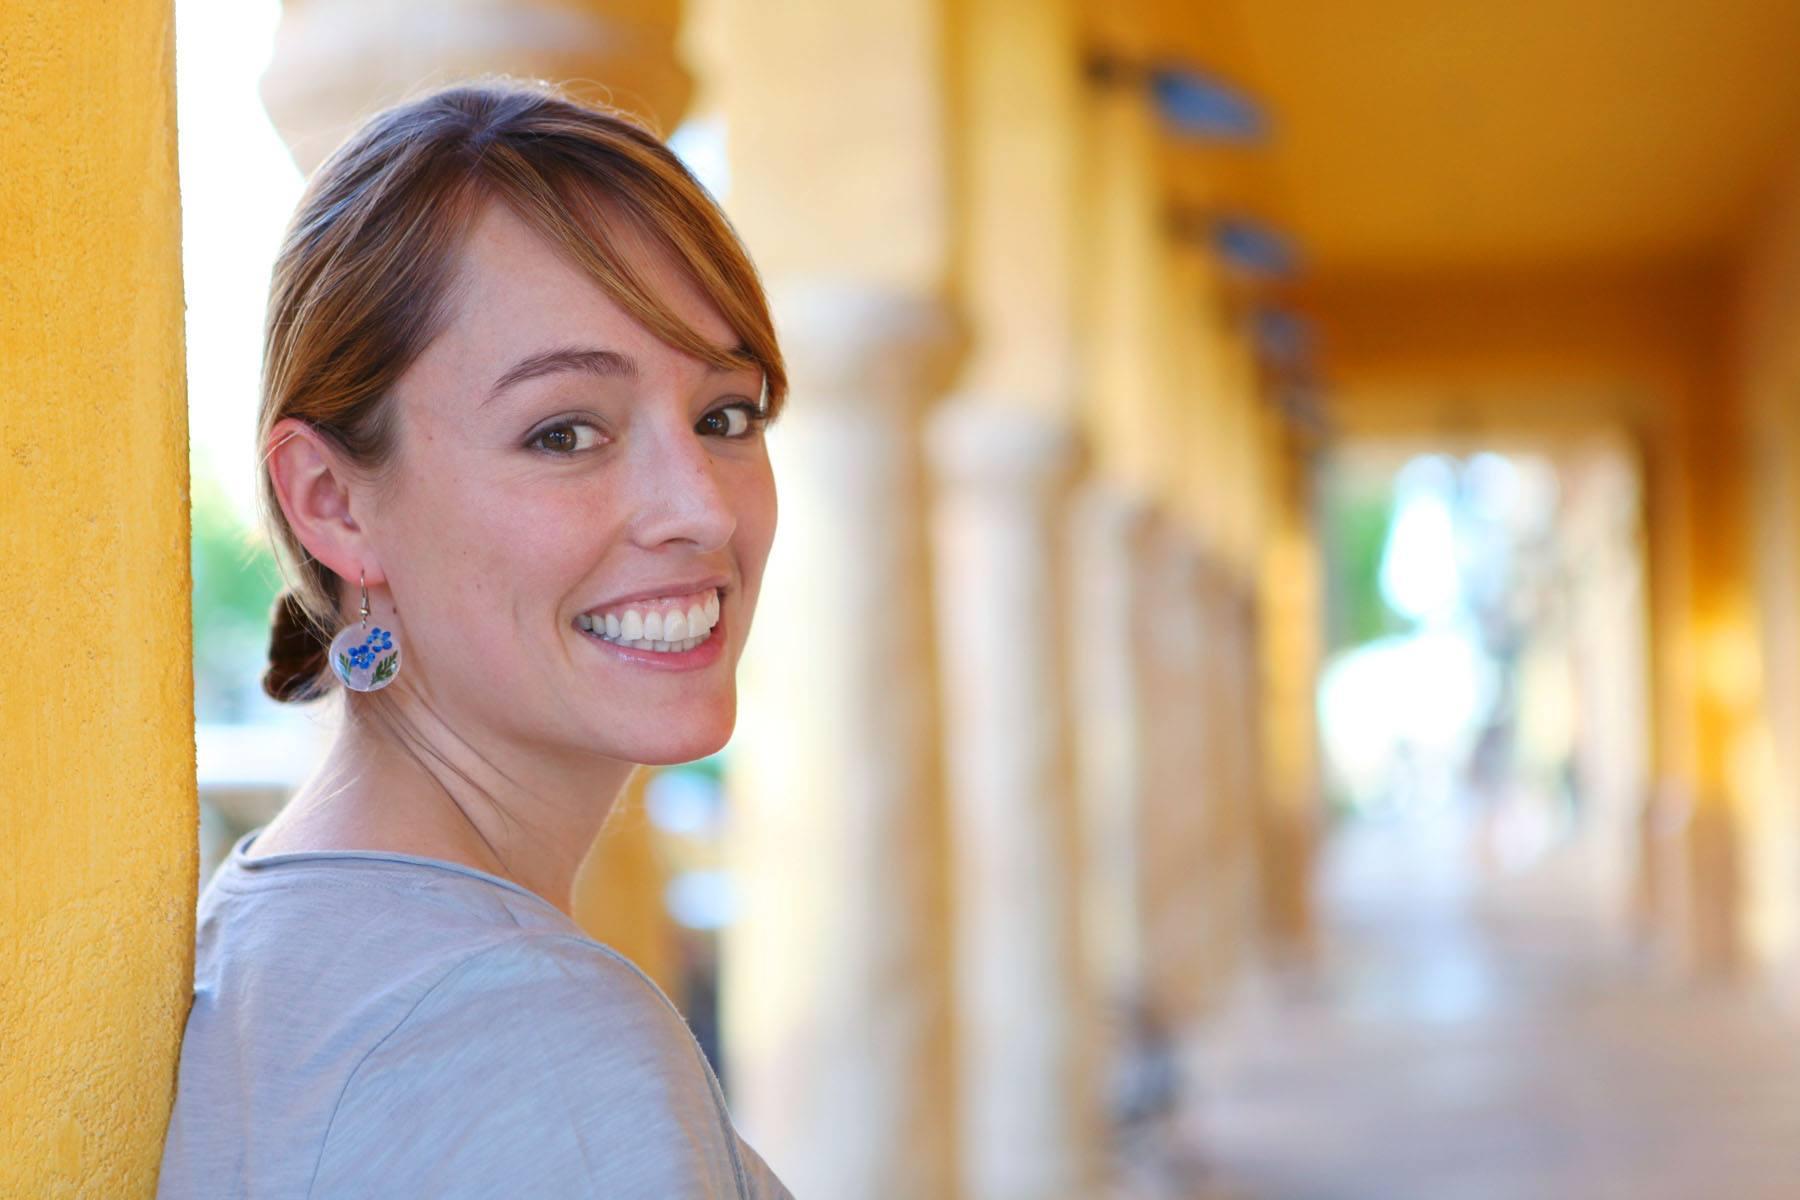 Amanda Skenandore